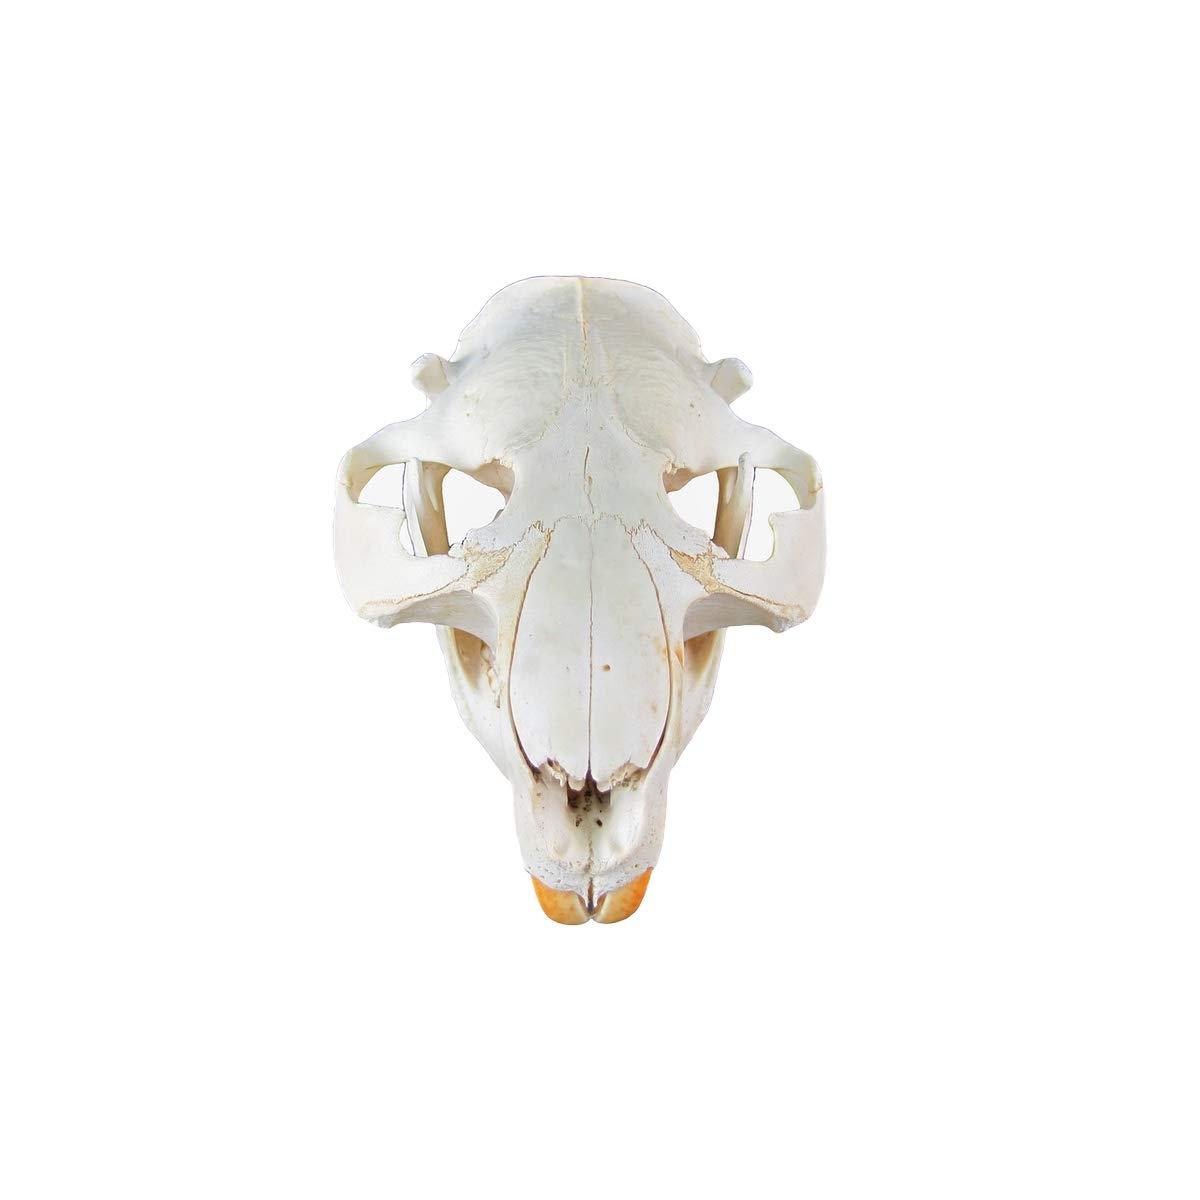 TG,LLC Treasure Gurus Genuine Beaver Skull Taxidermy Animal Bones Unique Animal Hunting Cabin Decor